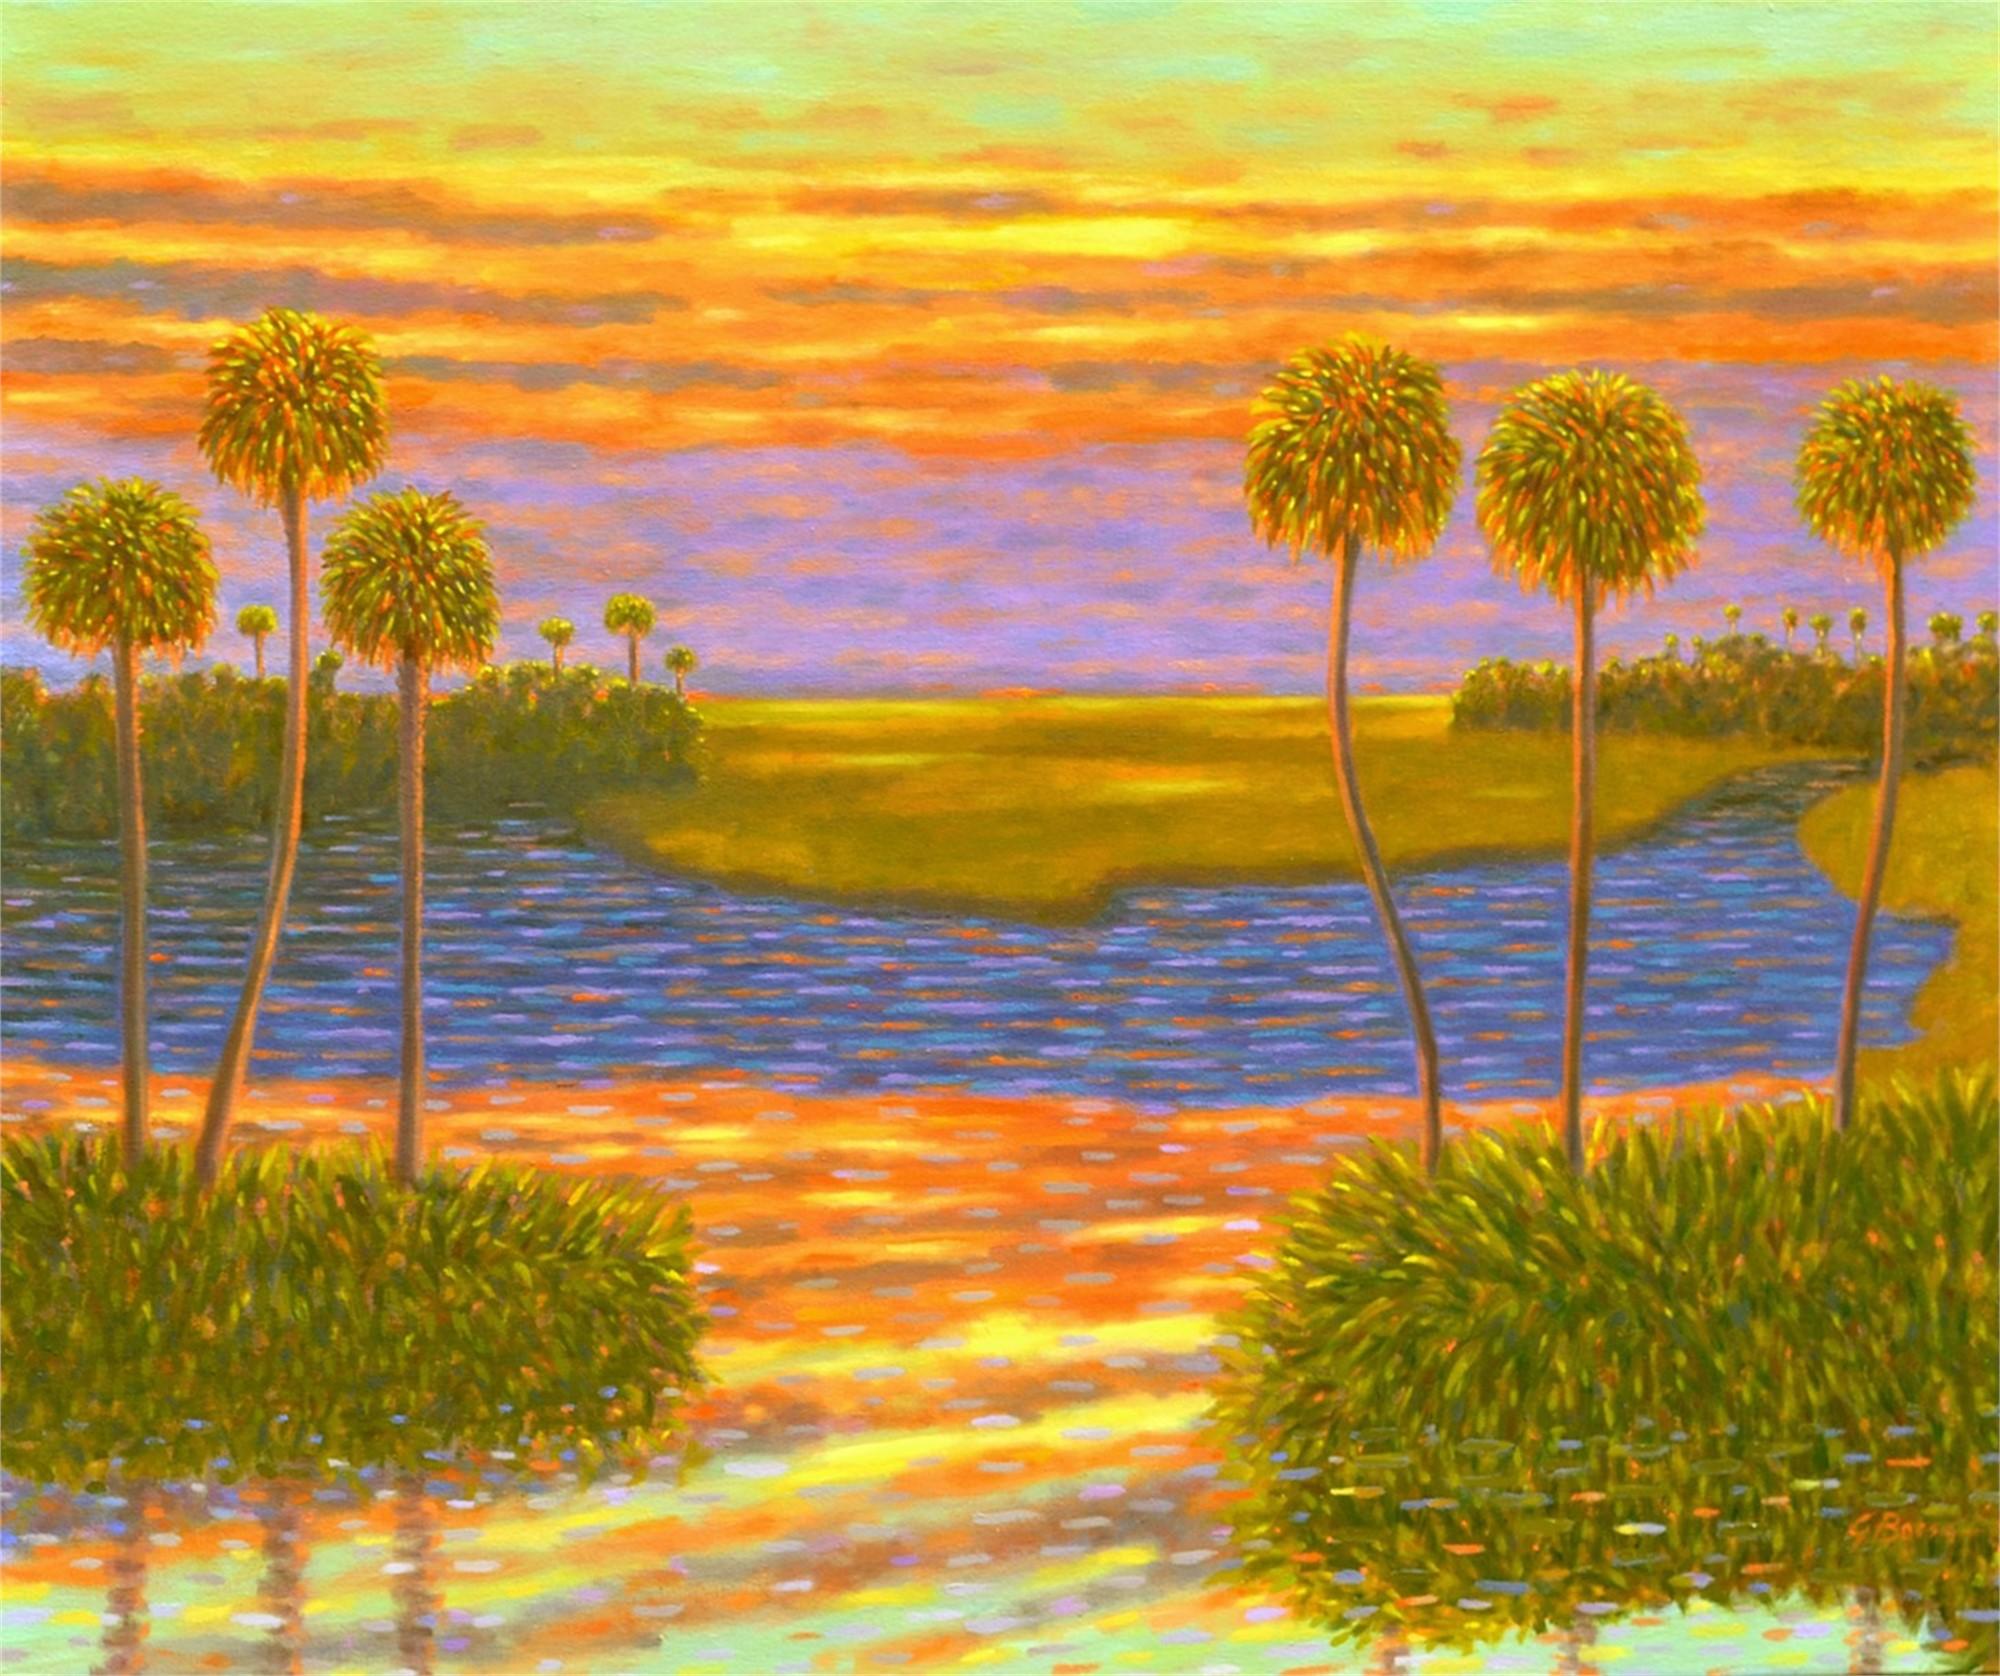 Sunset Interlude by Gary Borse